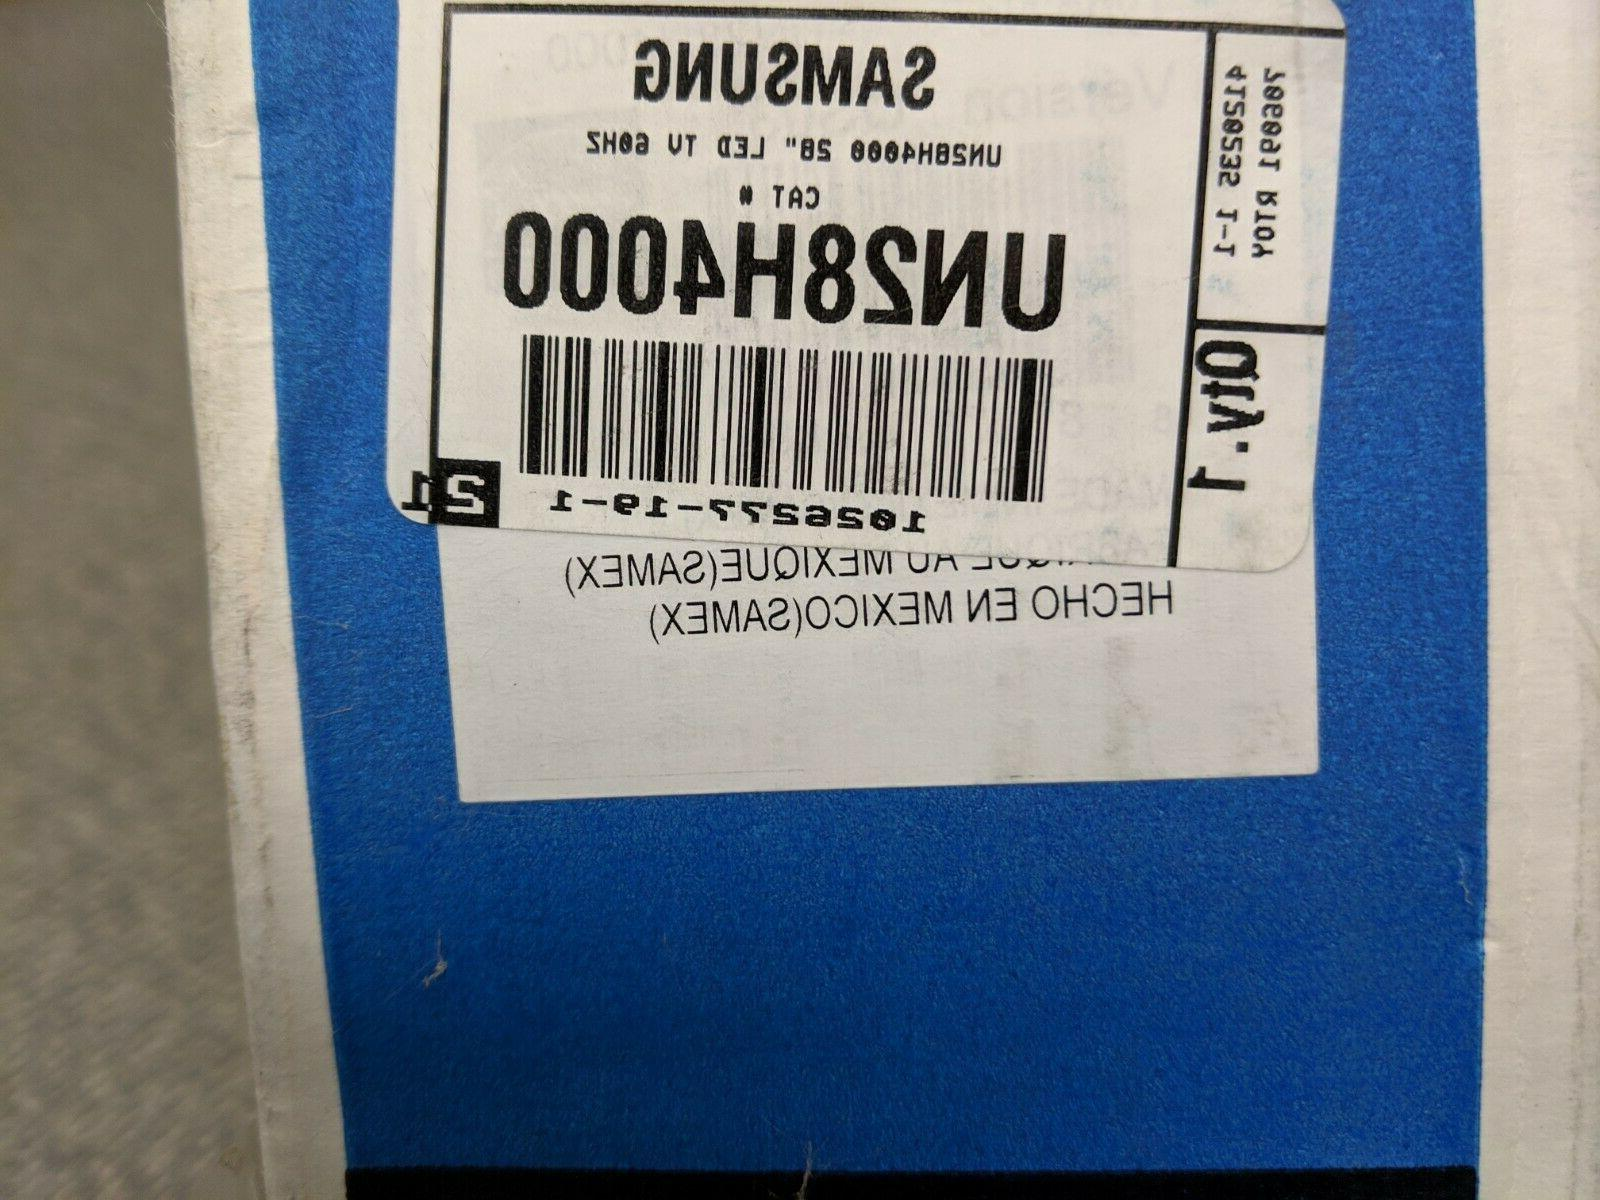 Samsung LED 4 series 4000